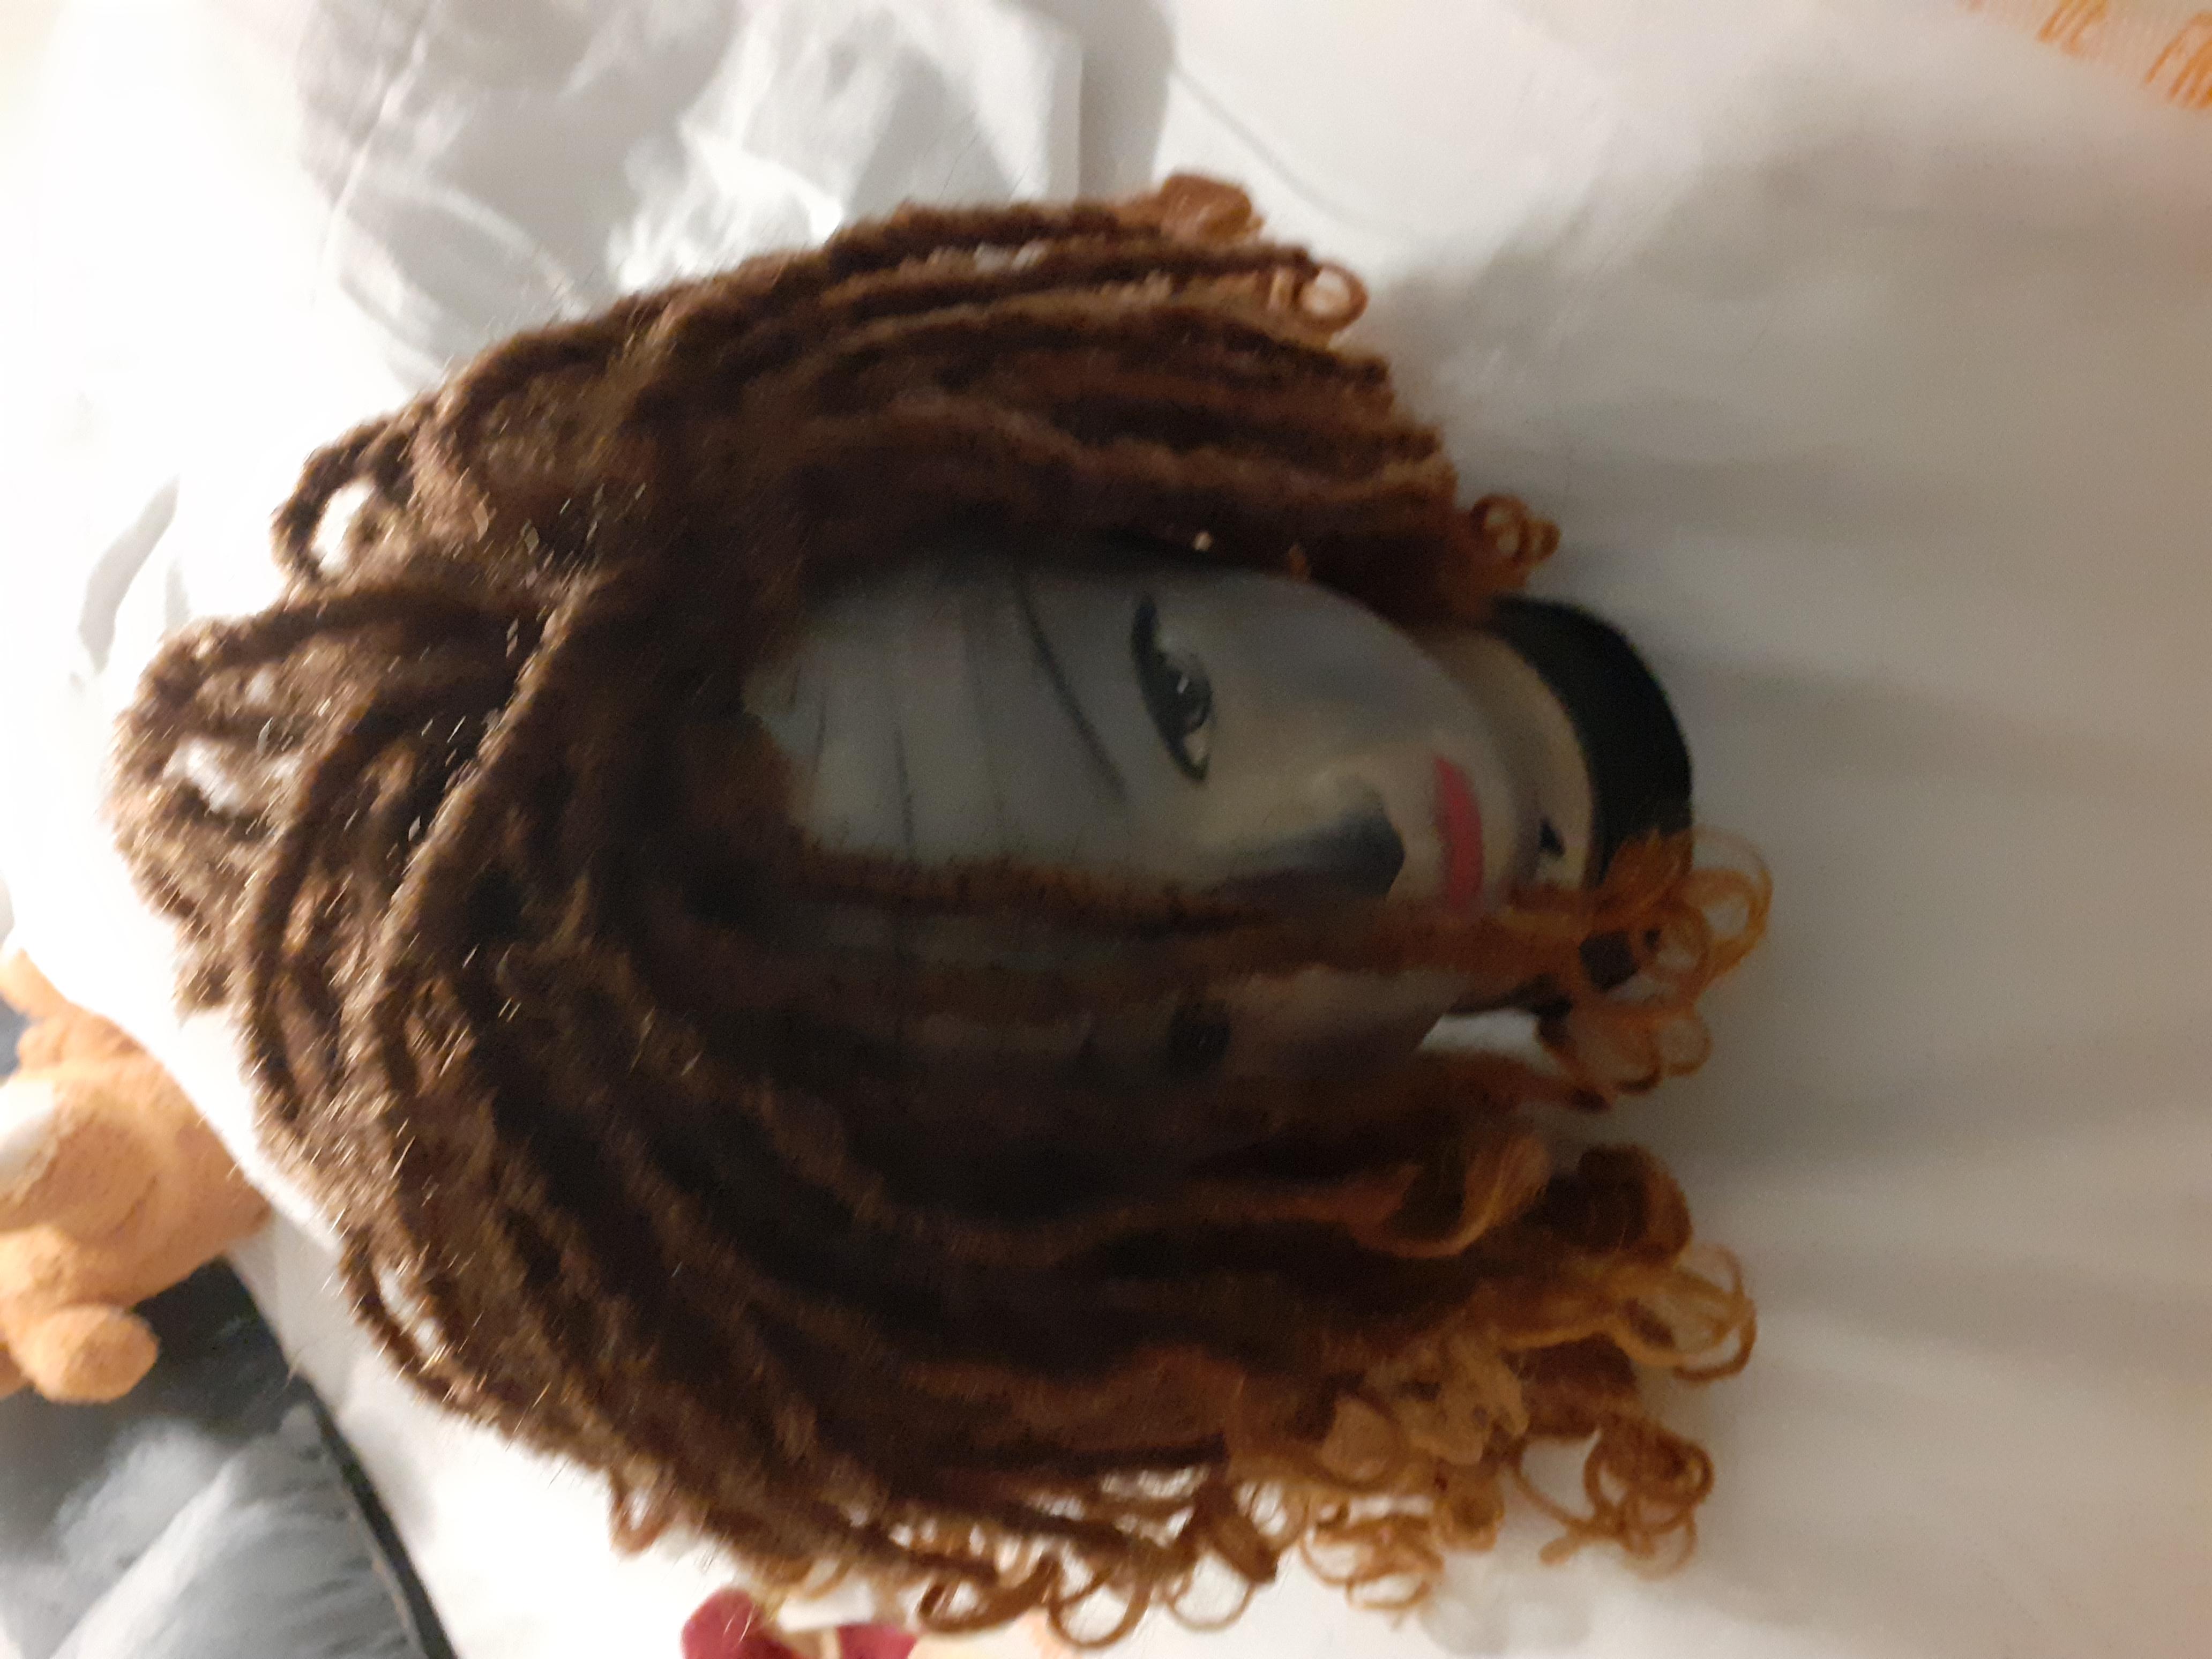 salon de coiffure afro tresse tresses box braids crochet braids vanilles tissages paris 75 77 78 91 92 93 94 95 BQLWLXXZ